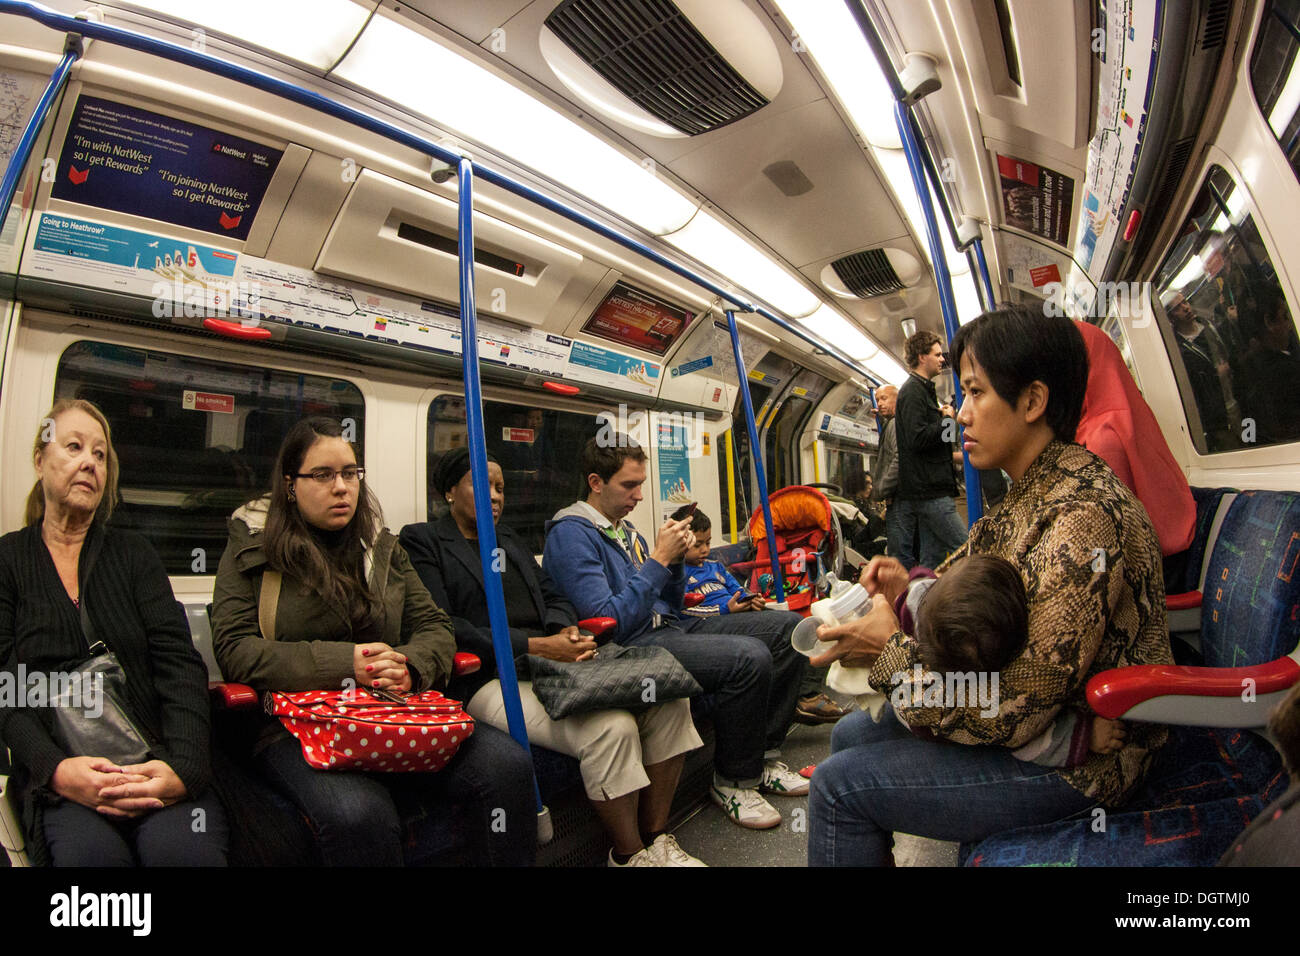 London Underground Train interior with passengers - Stock Image